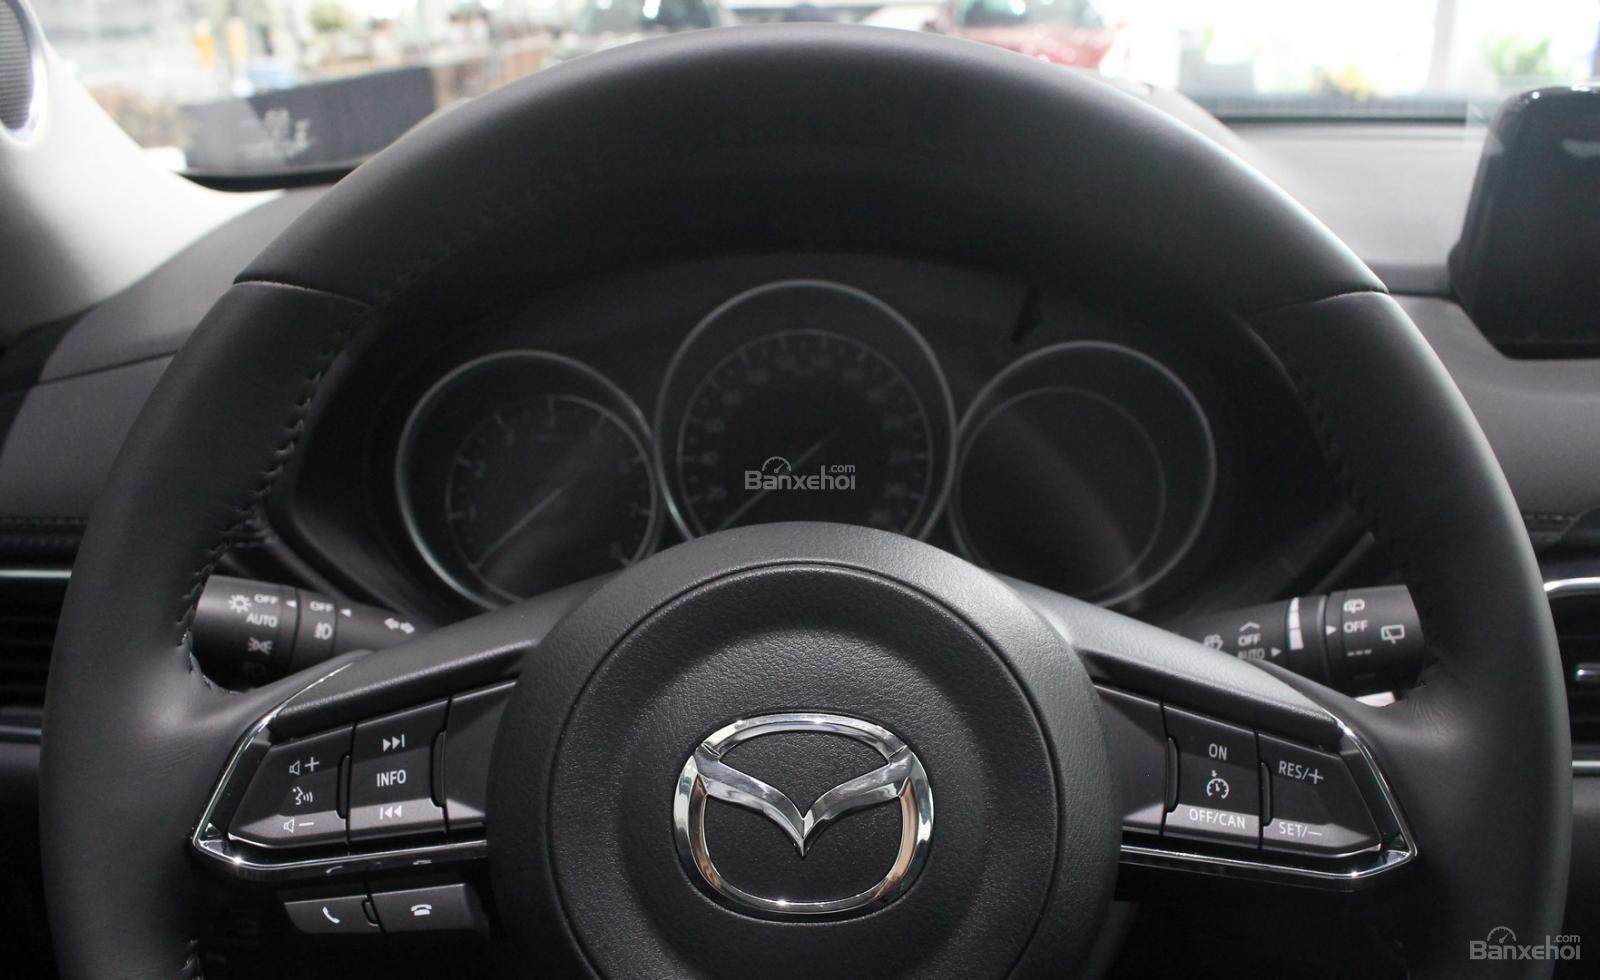 [Mazda Bình Triệu] Mazda CX-5 2019, LH 0941322979 giảm ngay 50 triệu, giá xe Mazda tốt nhất (6)